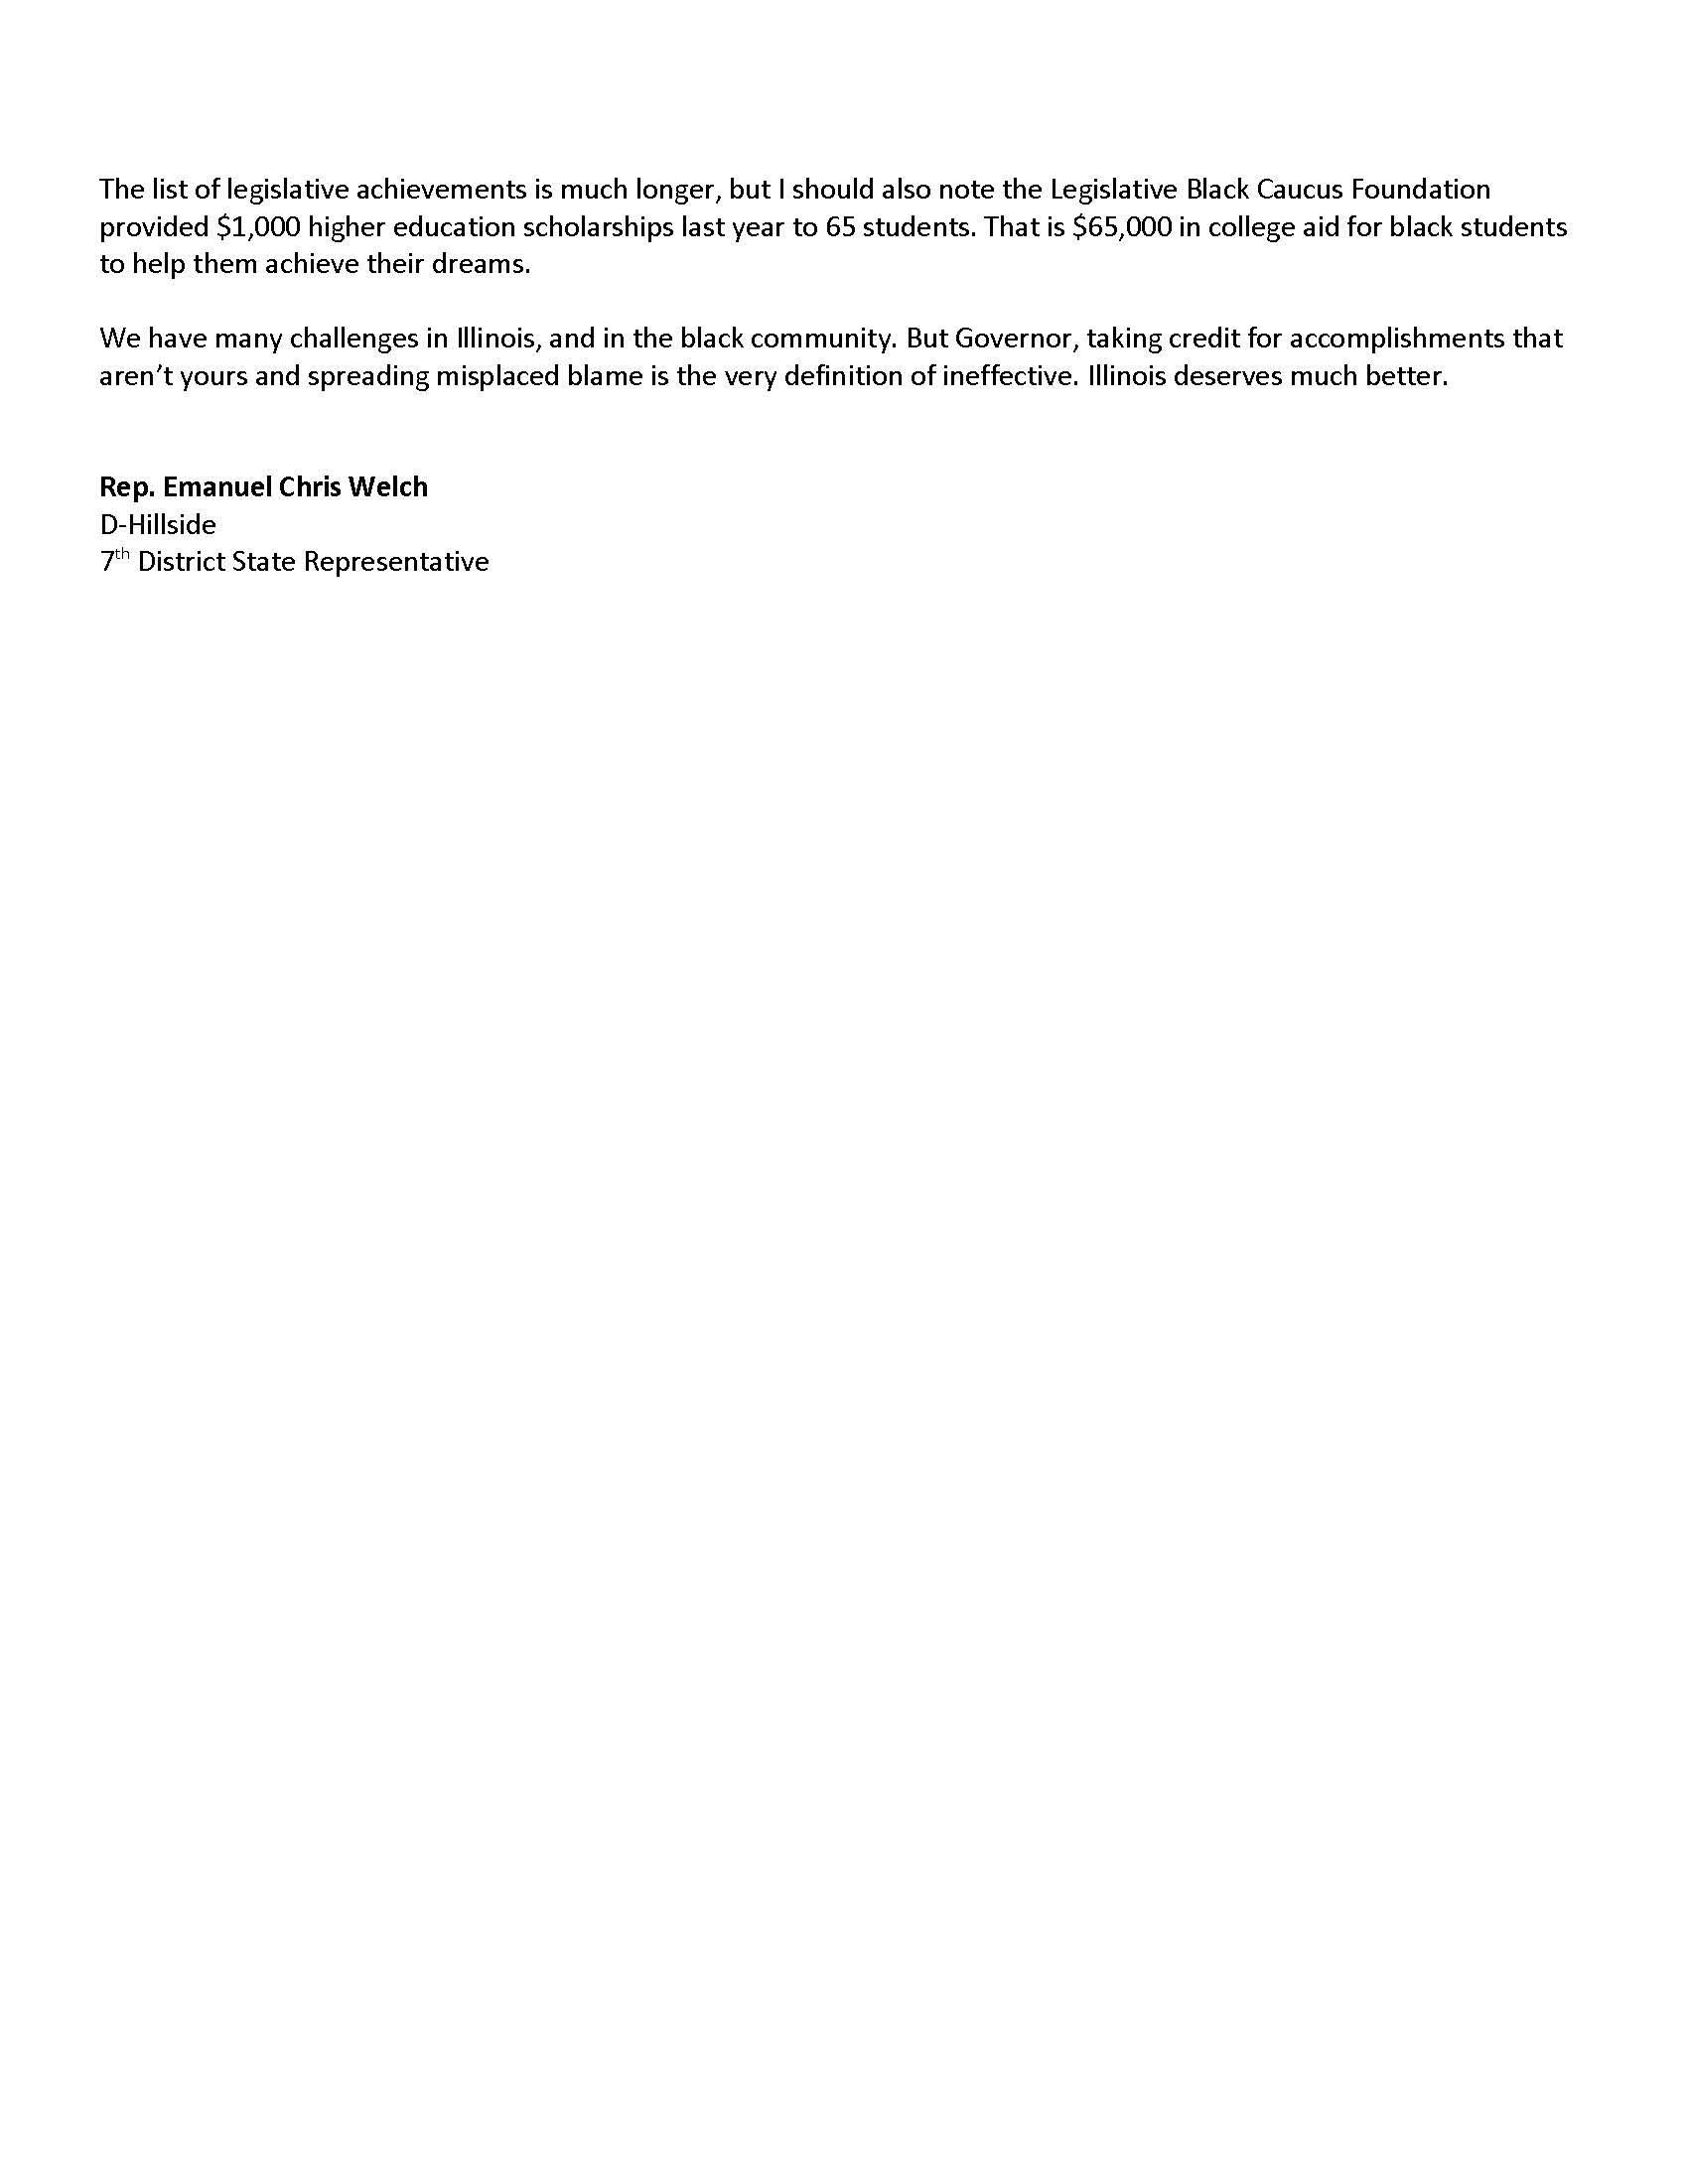 Rep. Welch black lawmaker effectiveness op-ed June 2018_Page_2.jpg